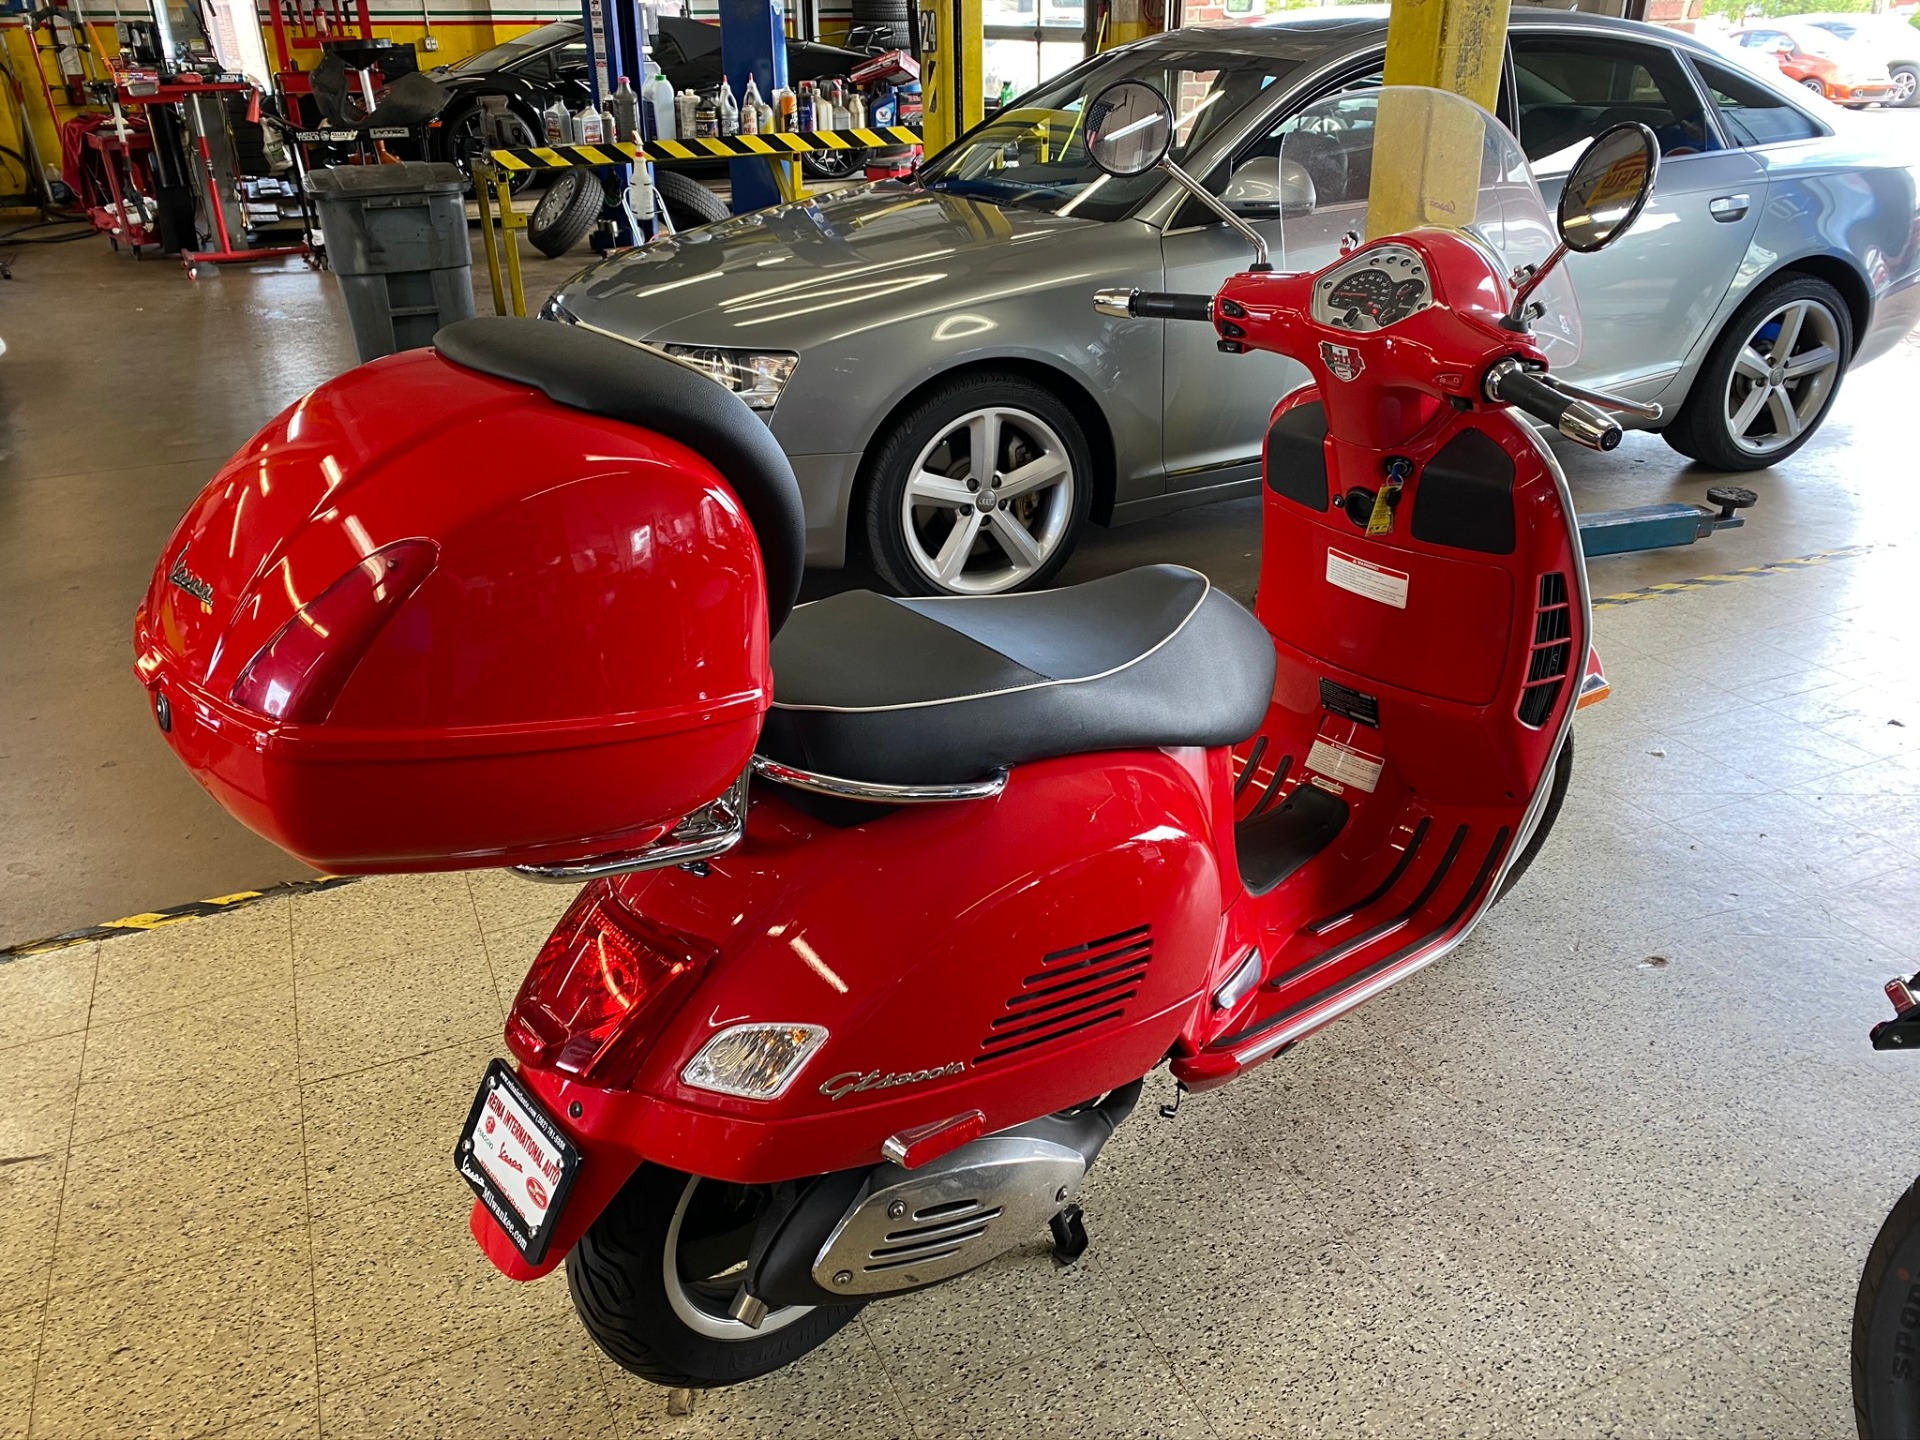 Used-2013-Vespa-GTS-Super-300cc